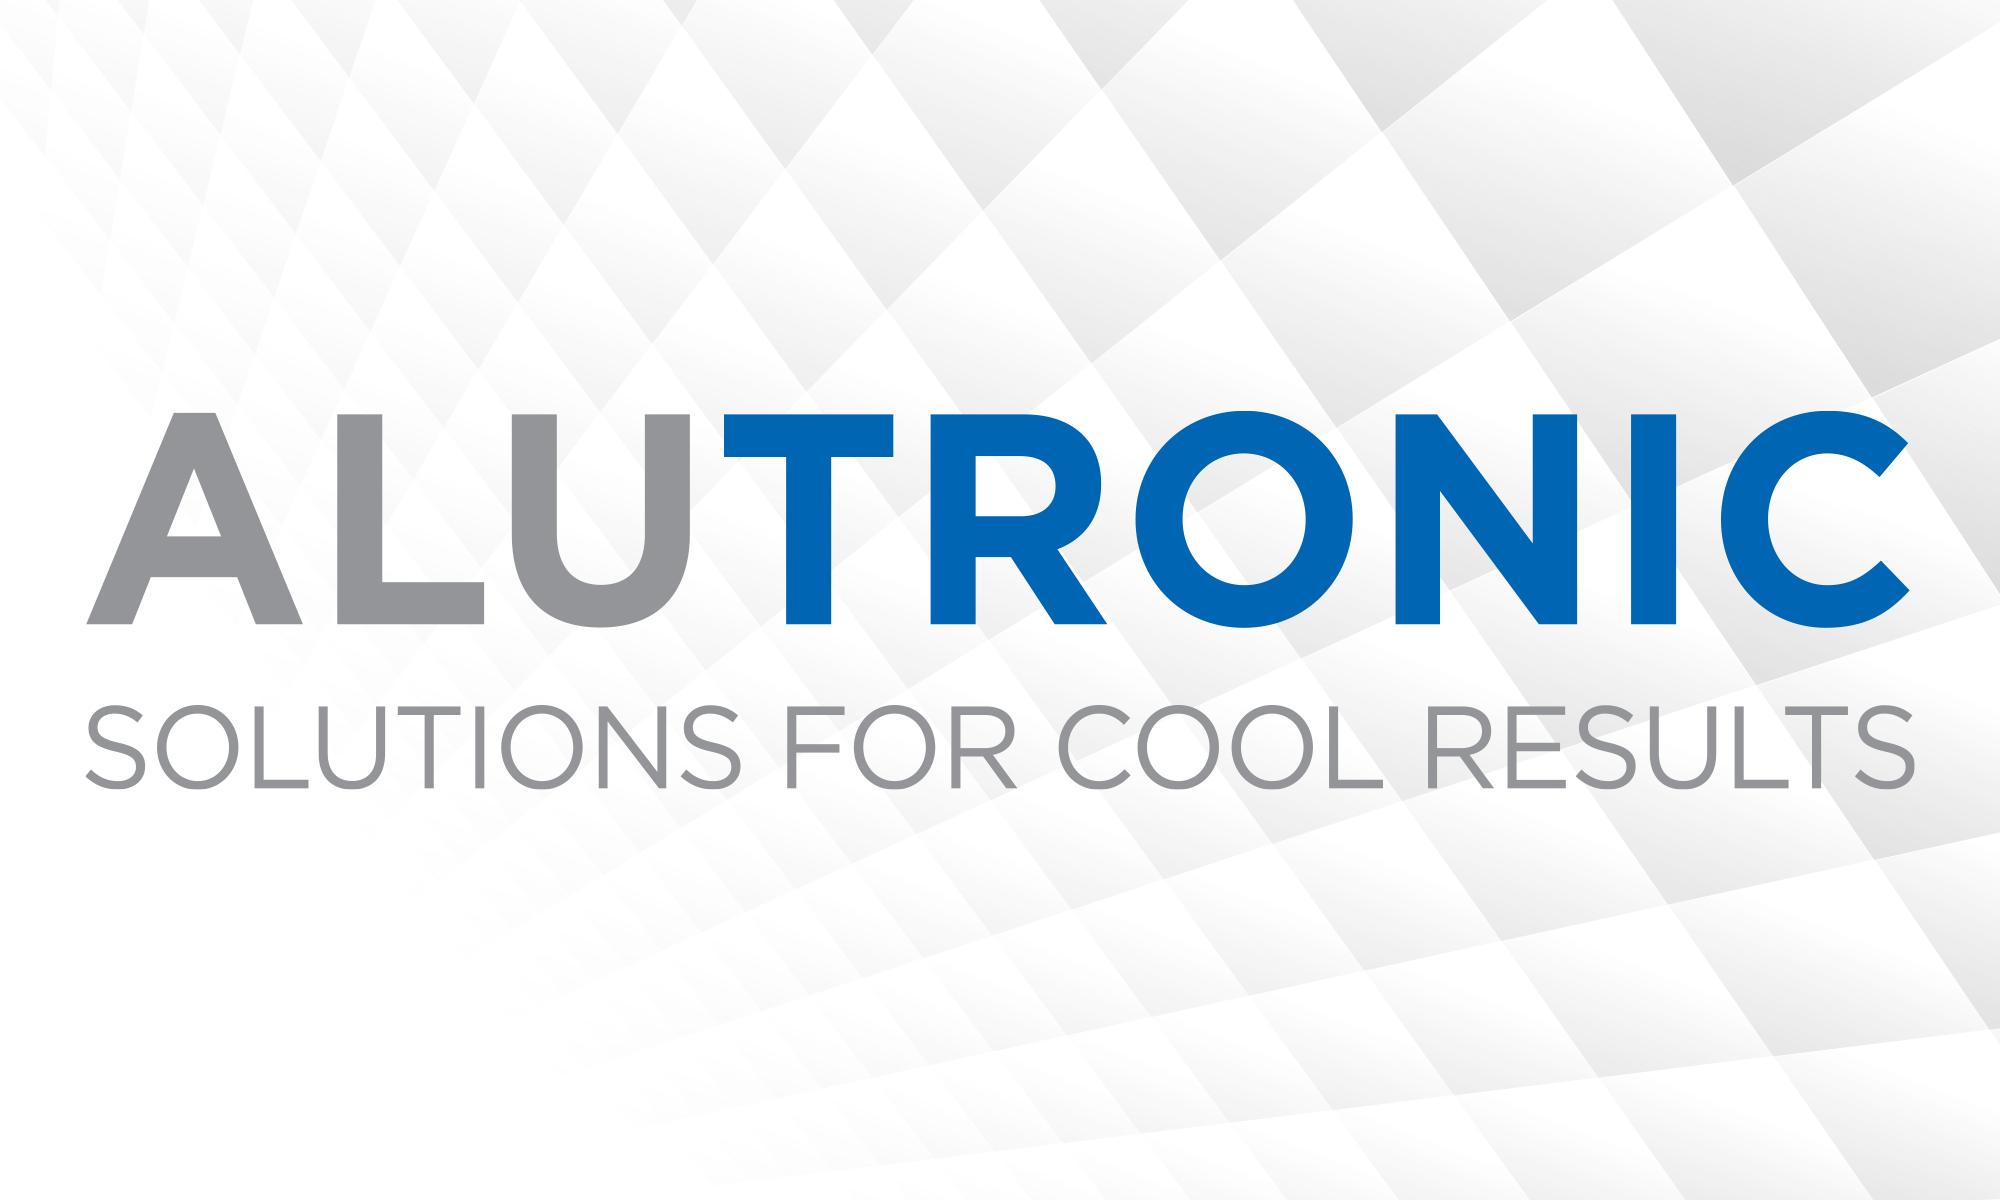 Productos Alutronic disponibles en la oferta de TME